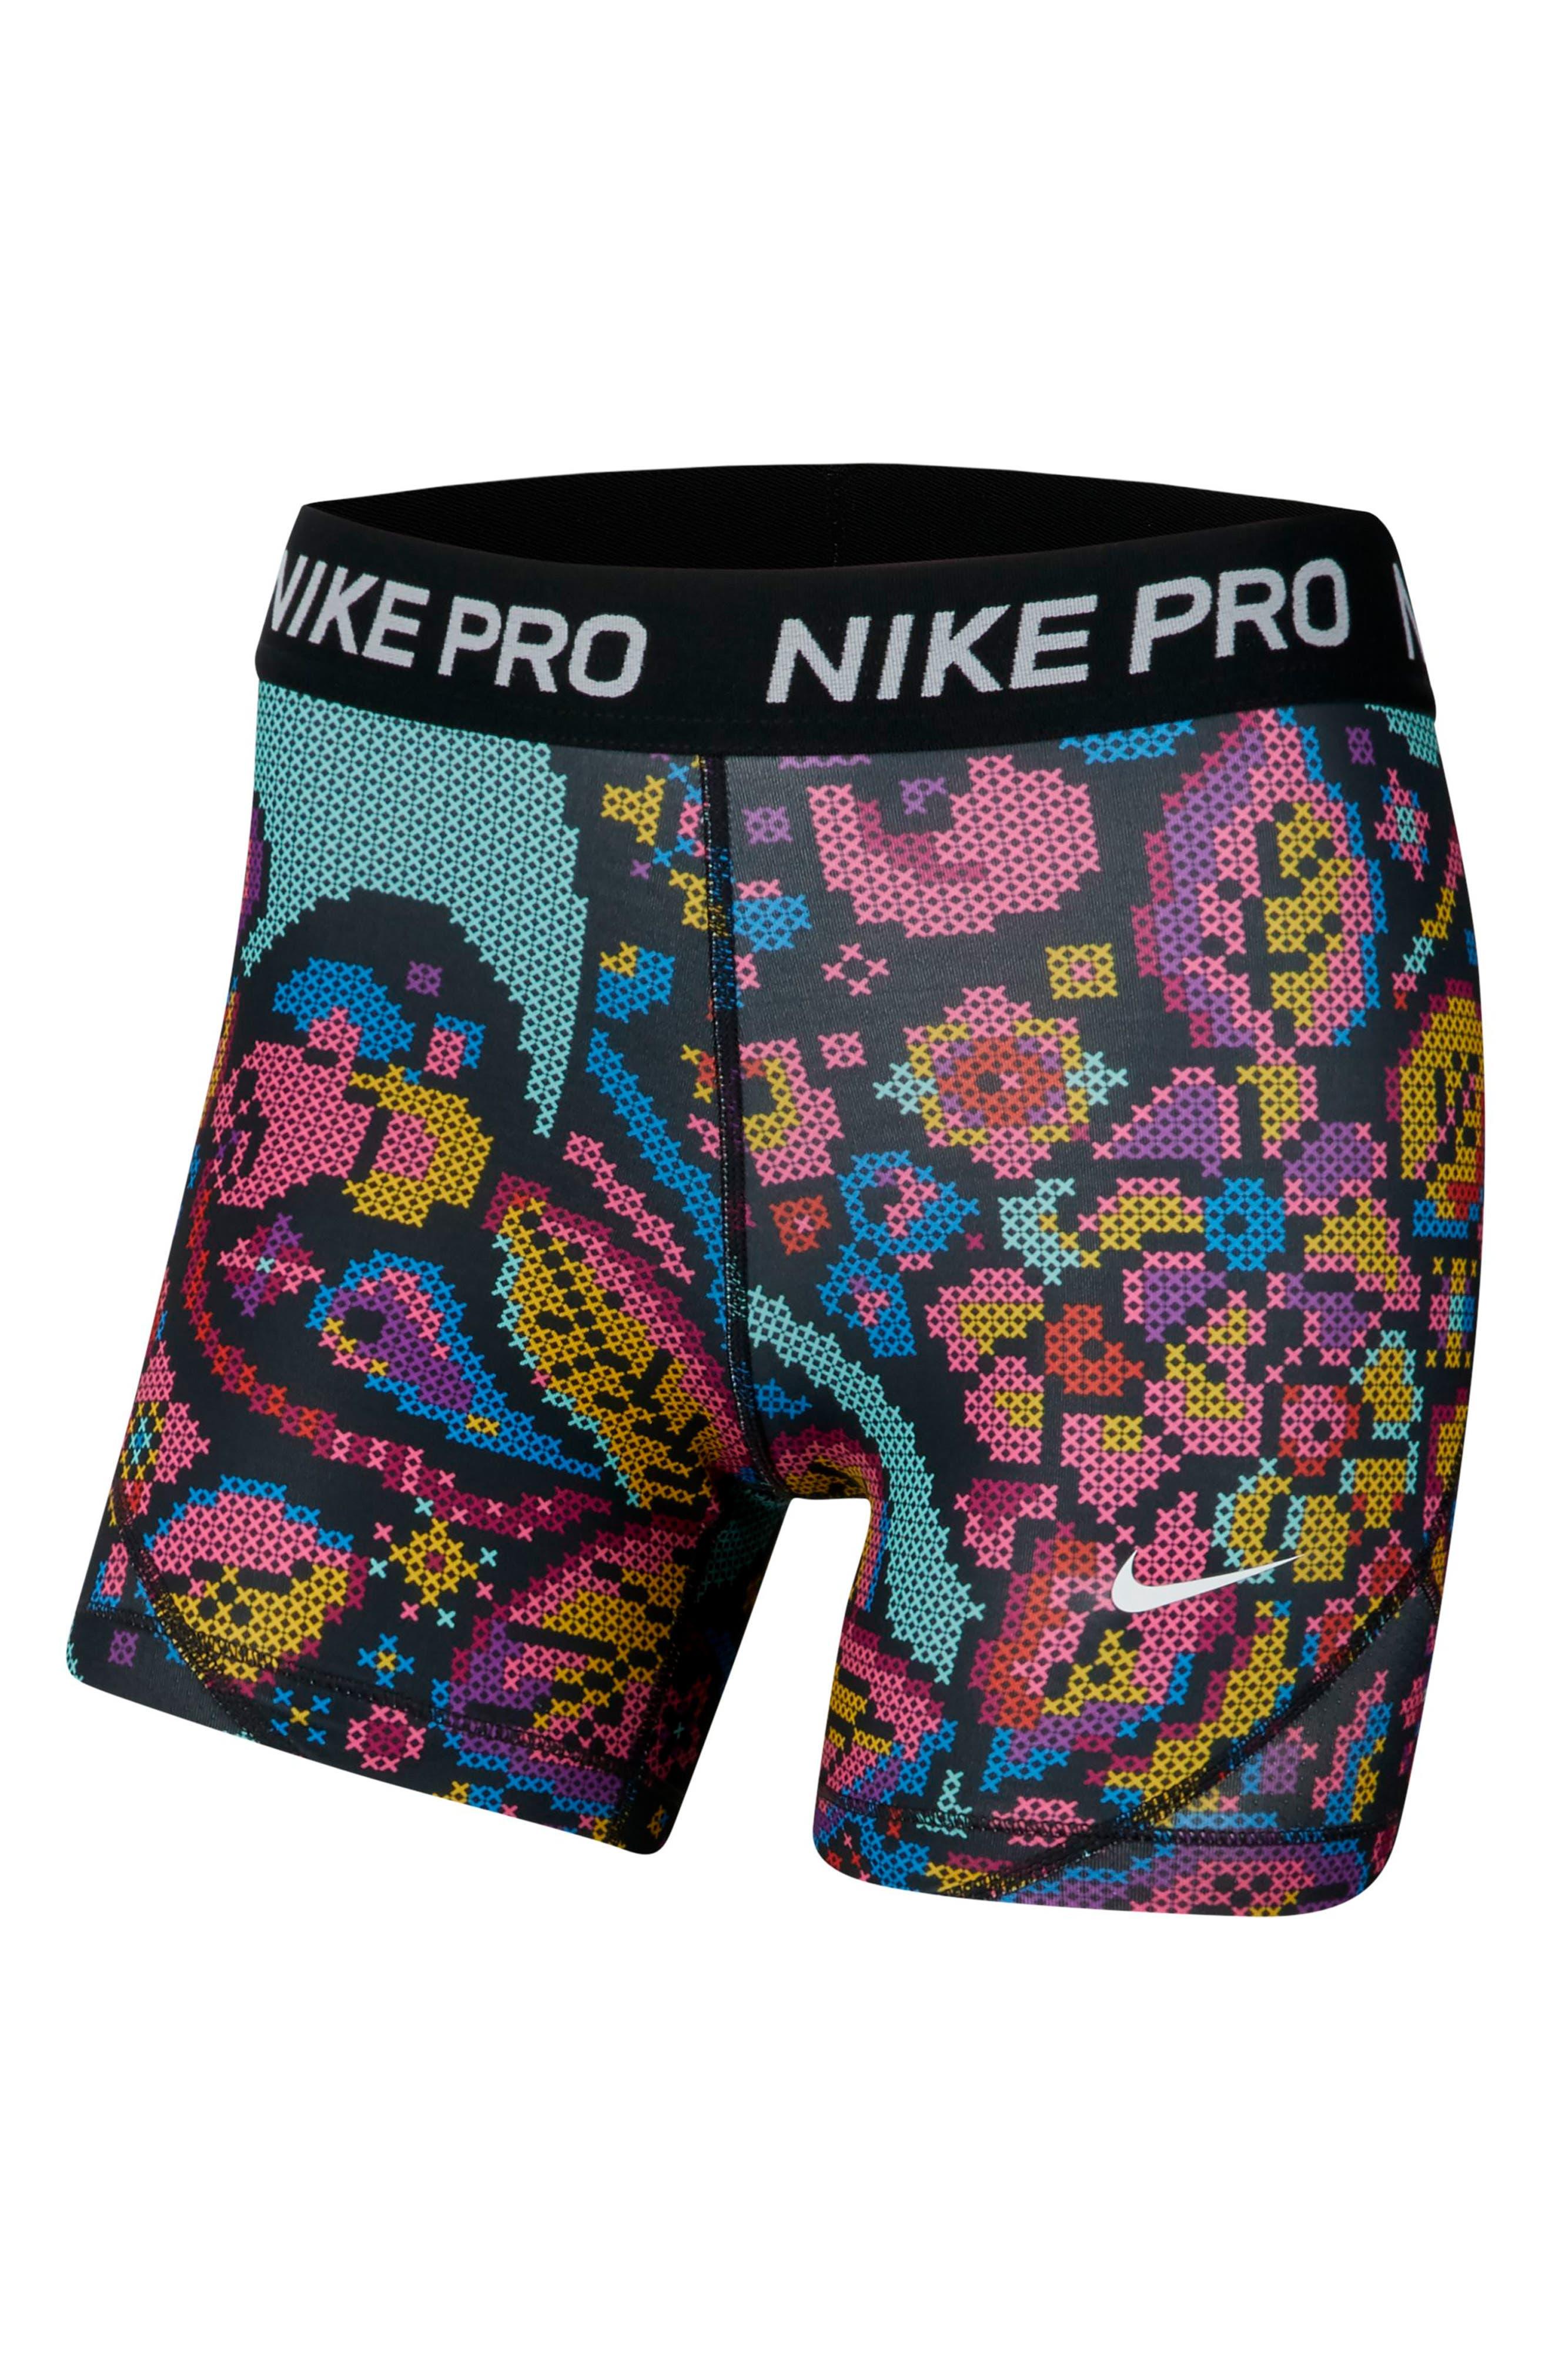 Girls Nike Pro DriFit Print Bike Shorts Size M (1012)  Black